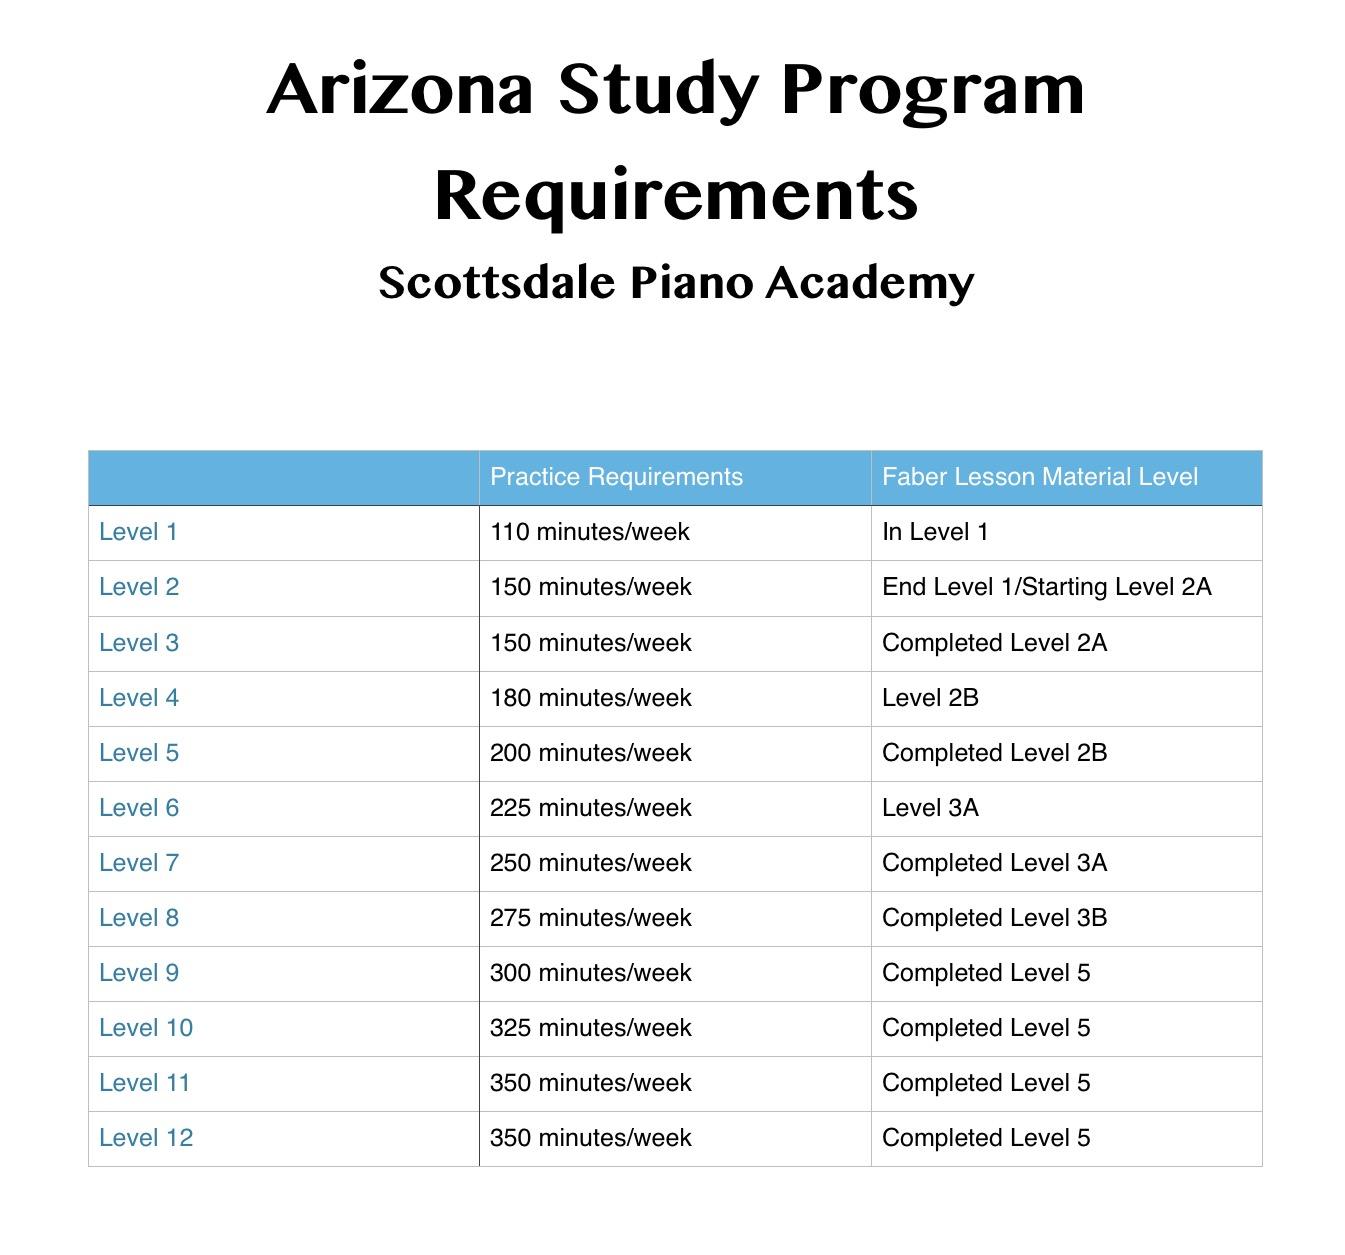 Arizona Study Program - Phoenix Music Teachers Association